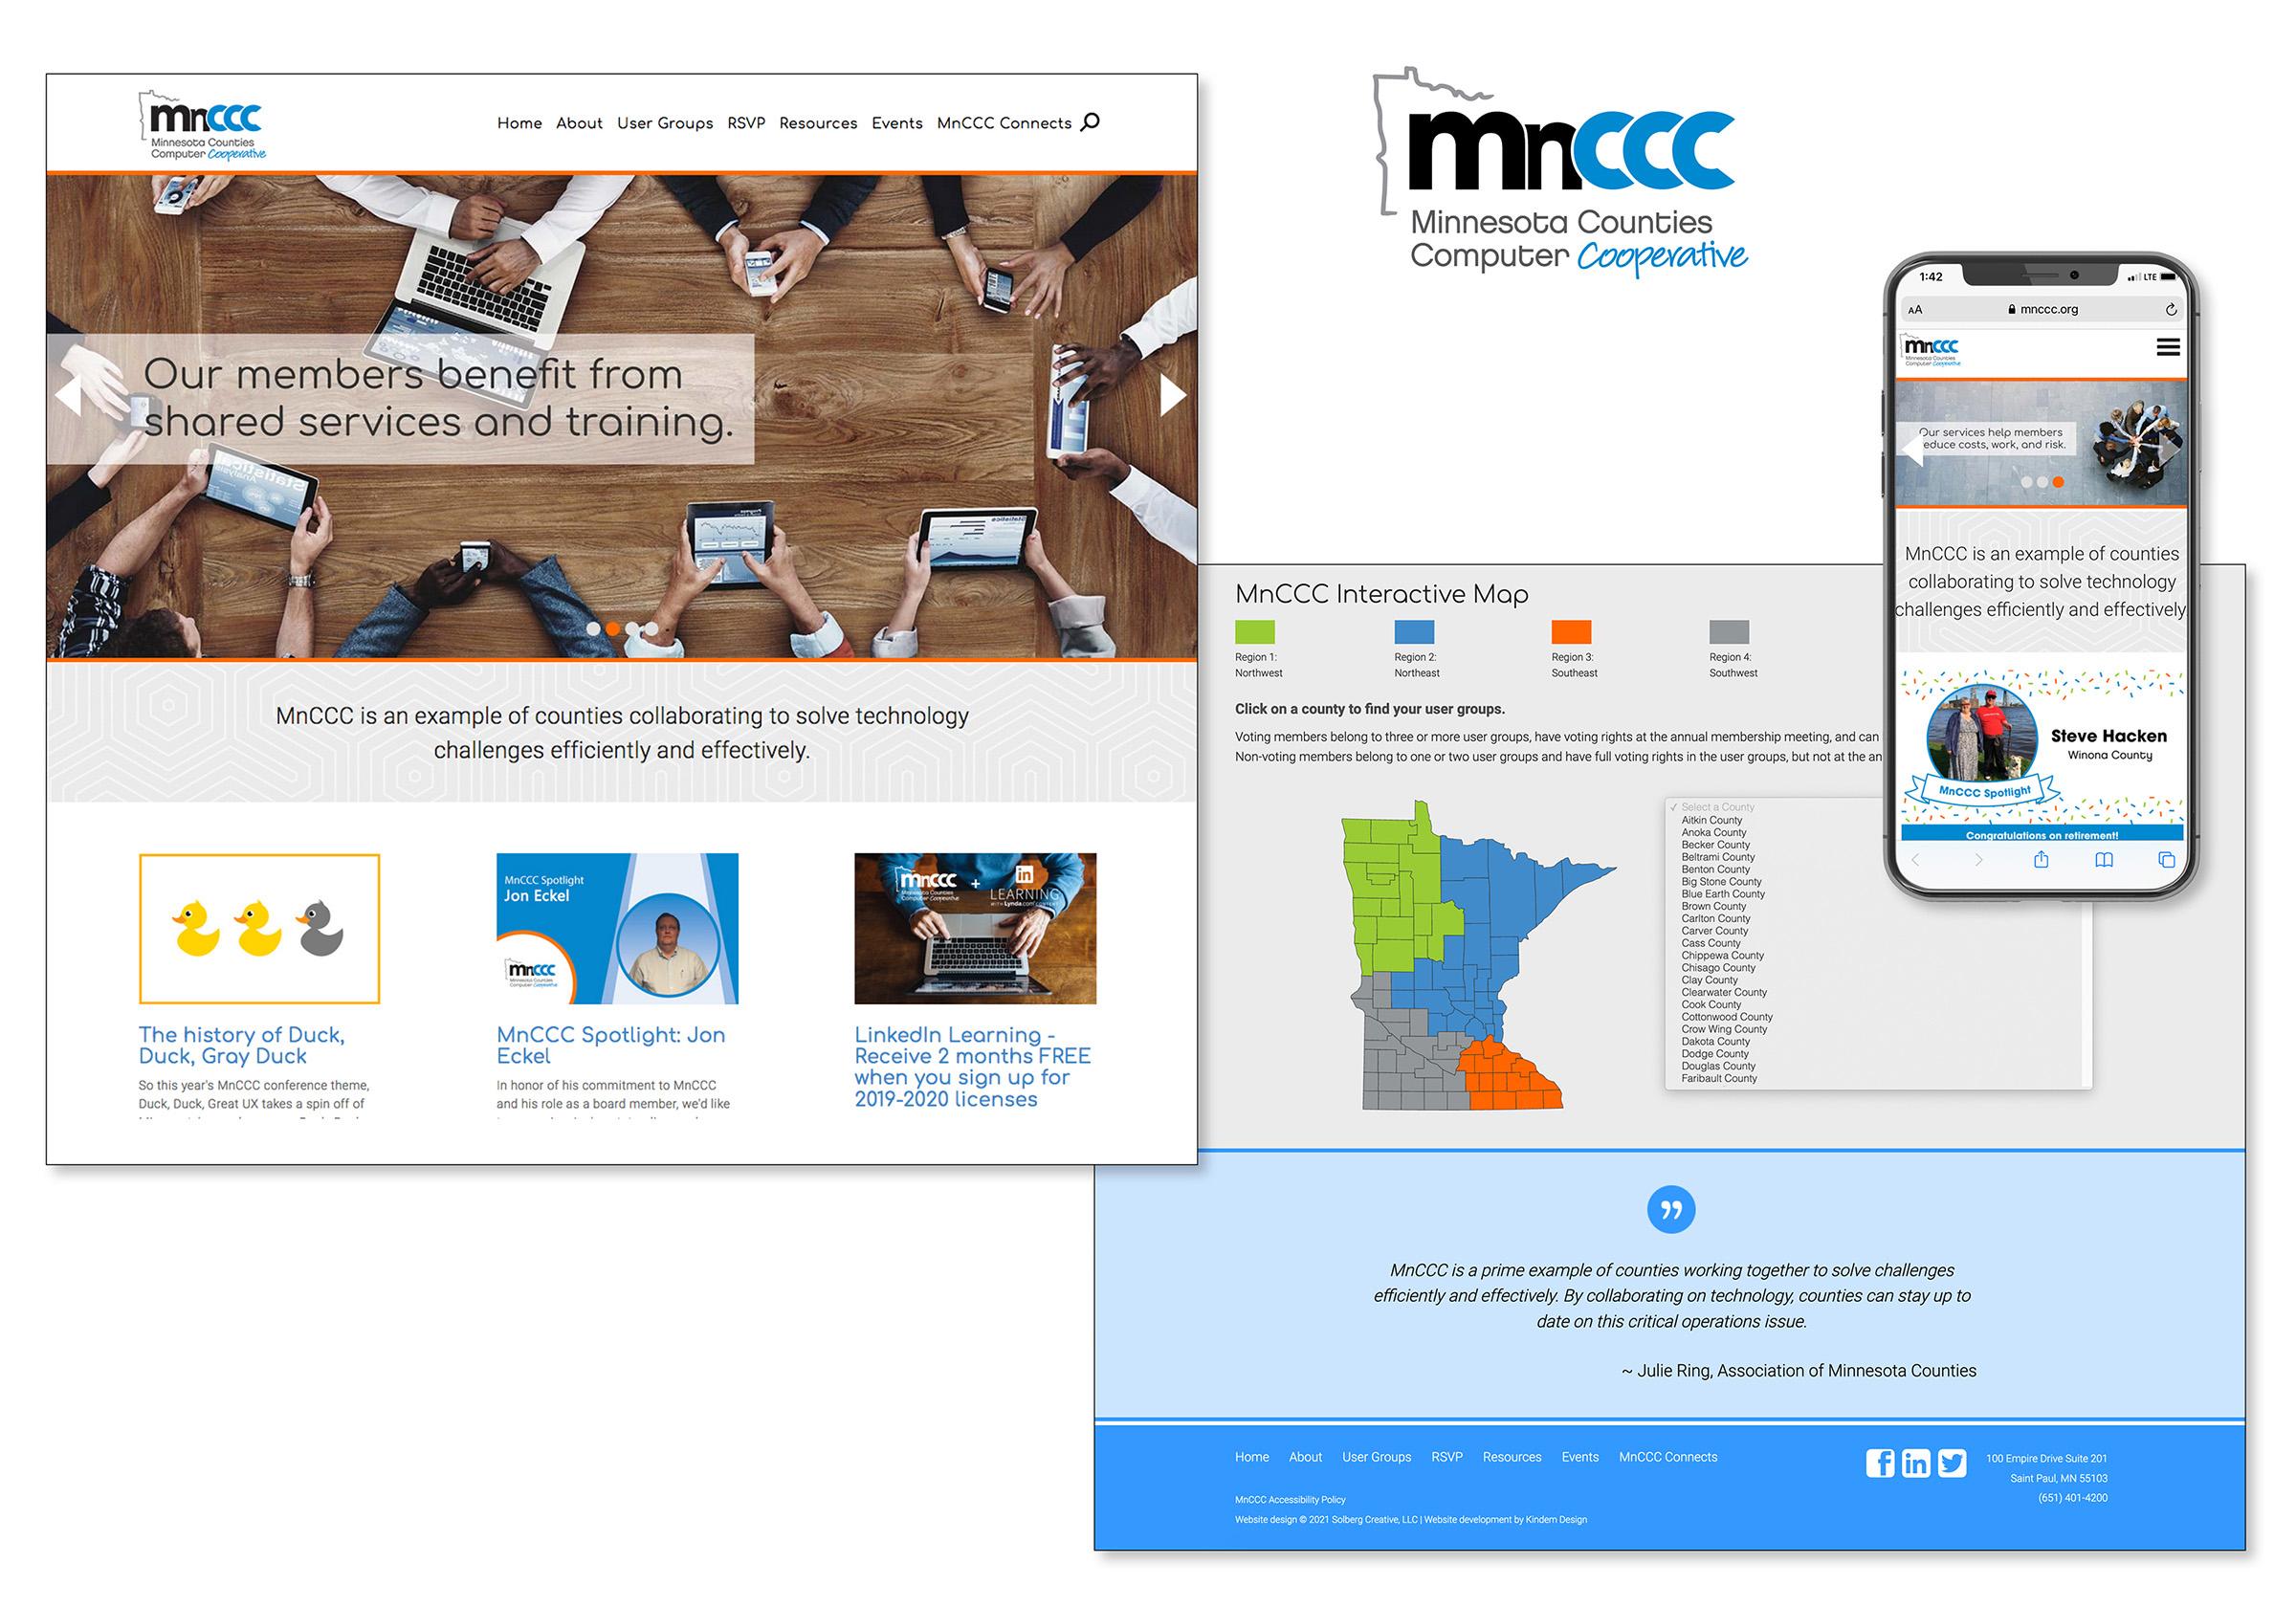 Image of website design for MnCCC, including desktop and mobile views.